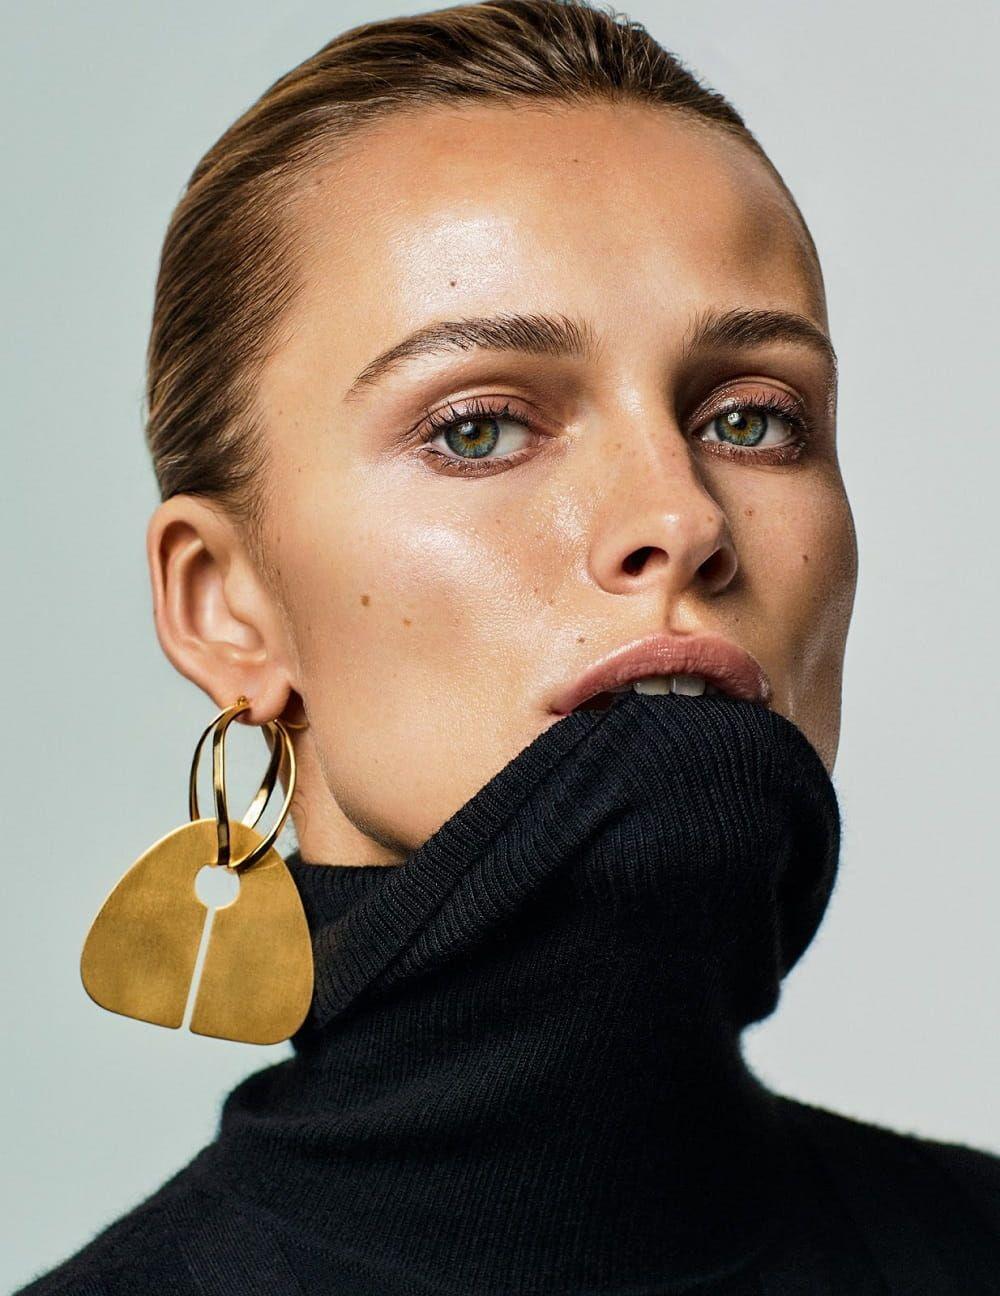 Photo of Edita Vilkeviciute by Alique x Nicola Knels for Vogue Germany – Minimal. / Visual.